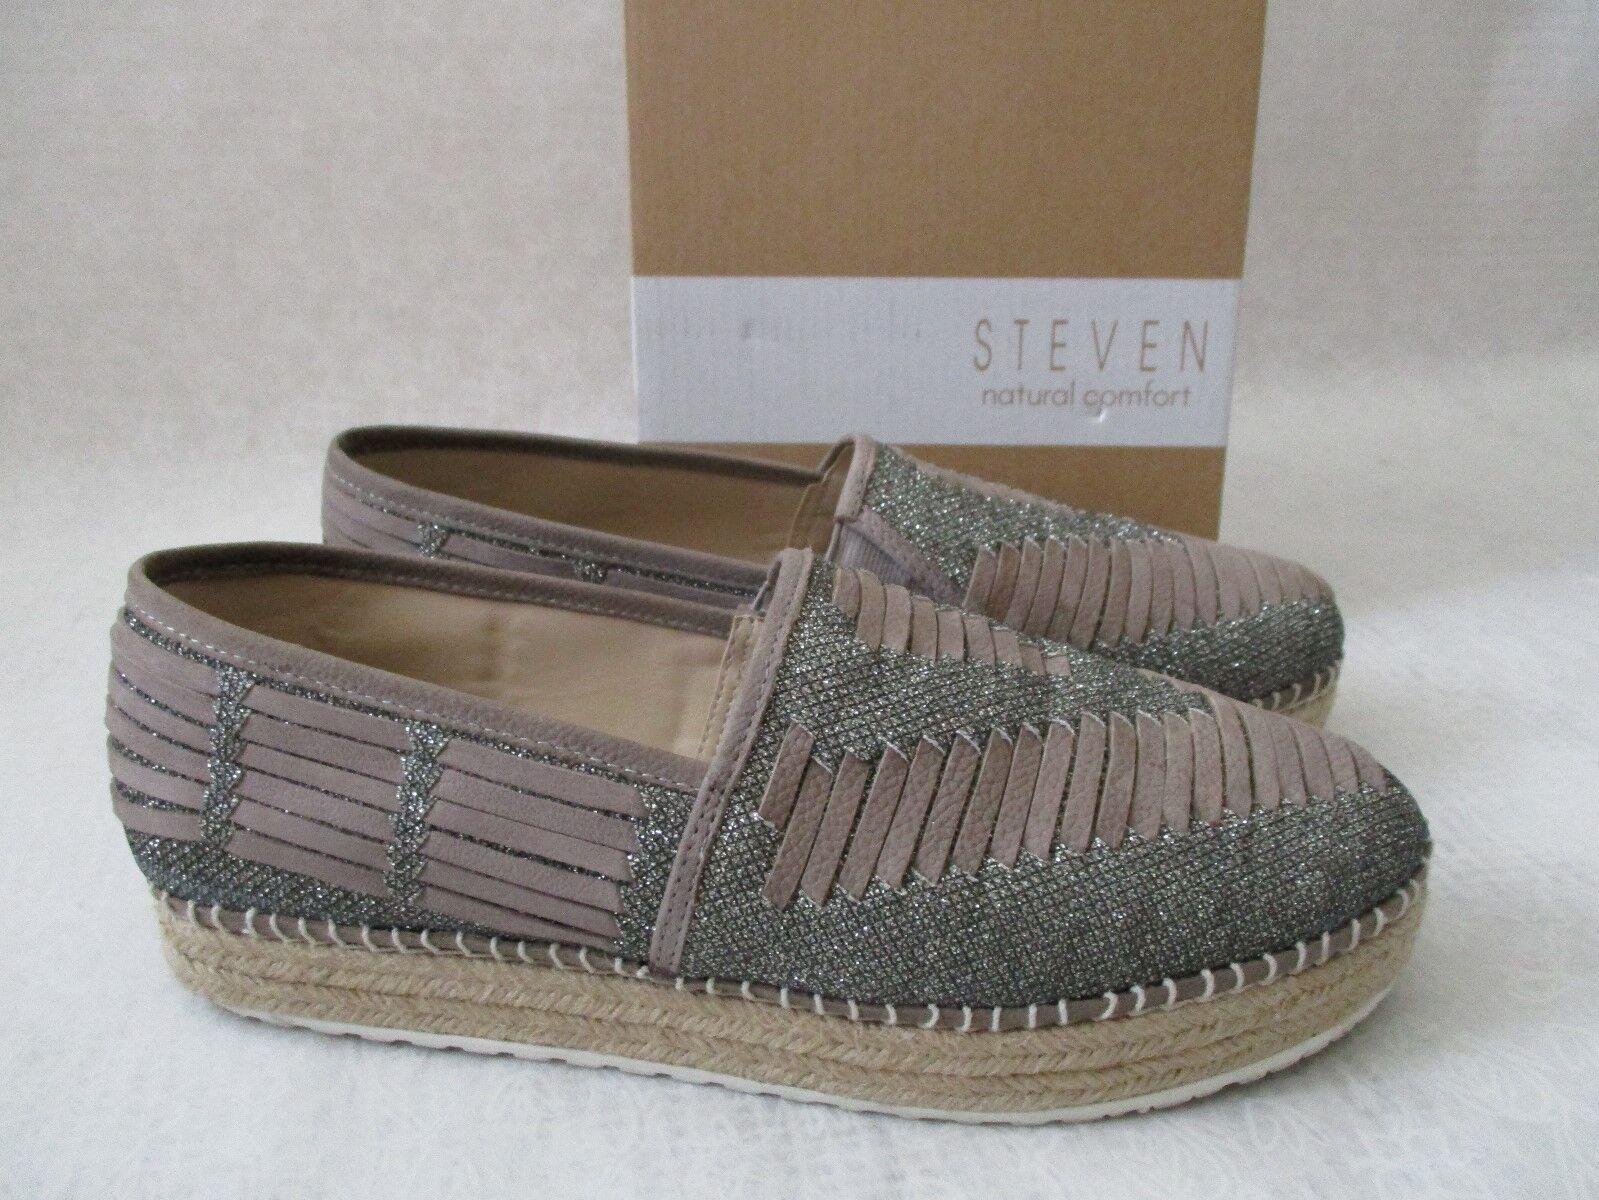 STEVEN BY STEVEN MADDEN GRAY NC-CHARM FLAT Schuhe SIZE 9 M - NEU W BOX